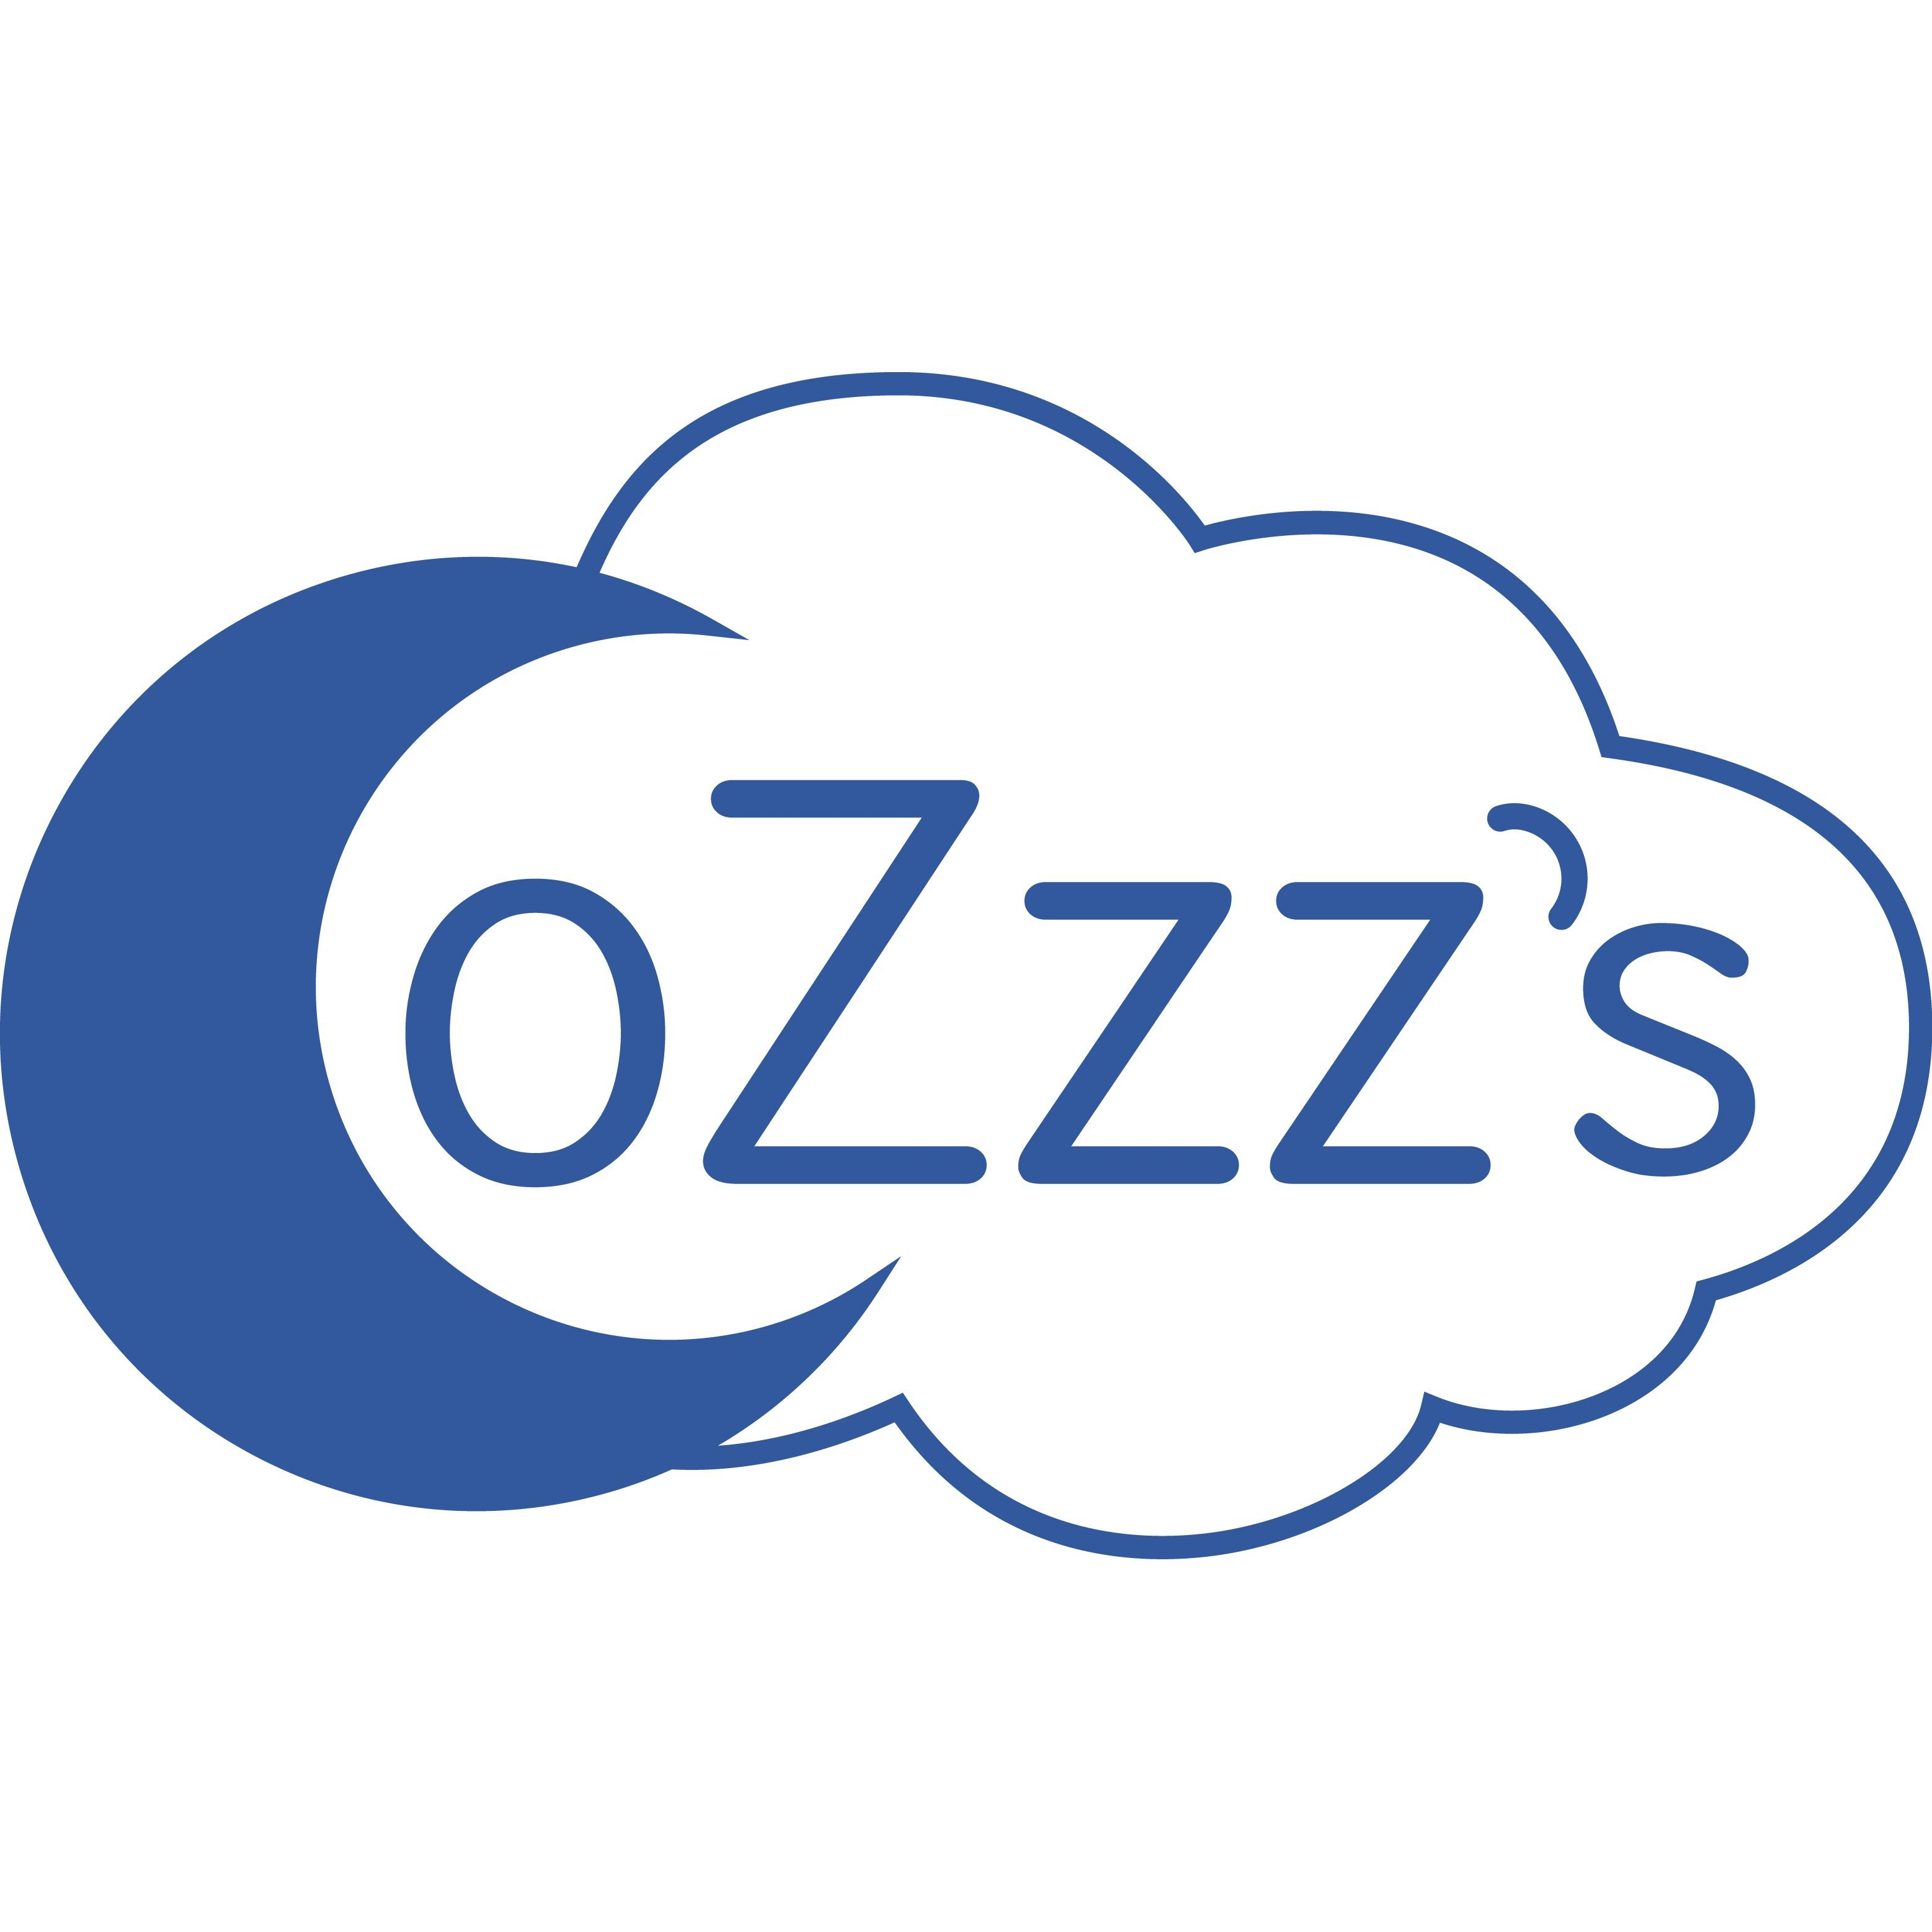 CoZzzs - Charleston, SC 29412 - (843)810-2898 | ShowMeLocal.com